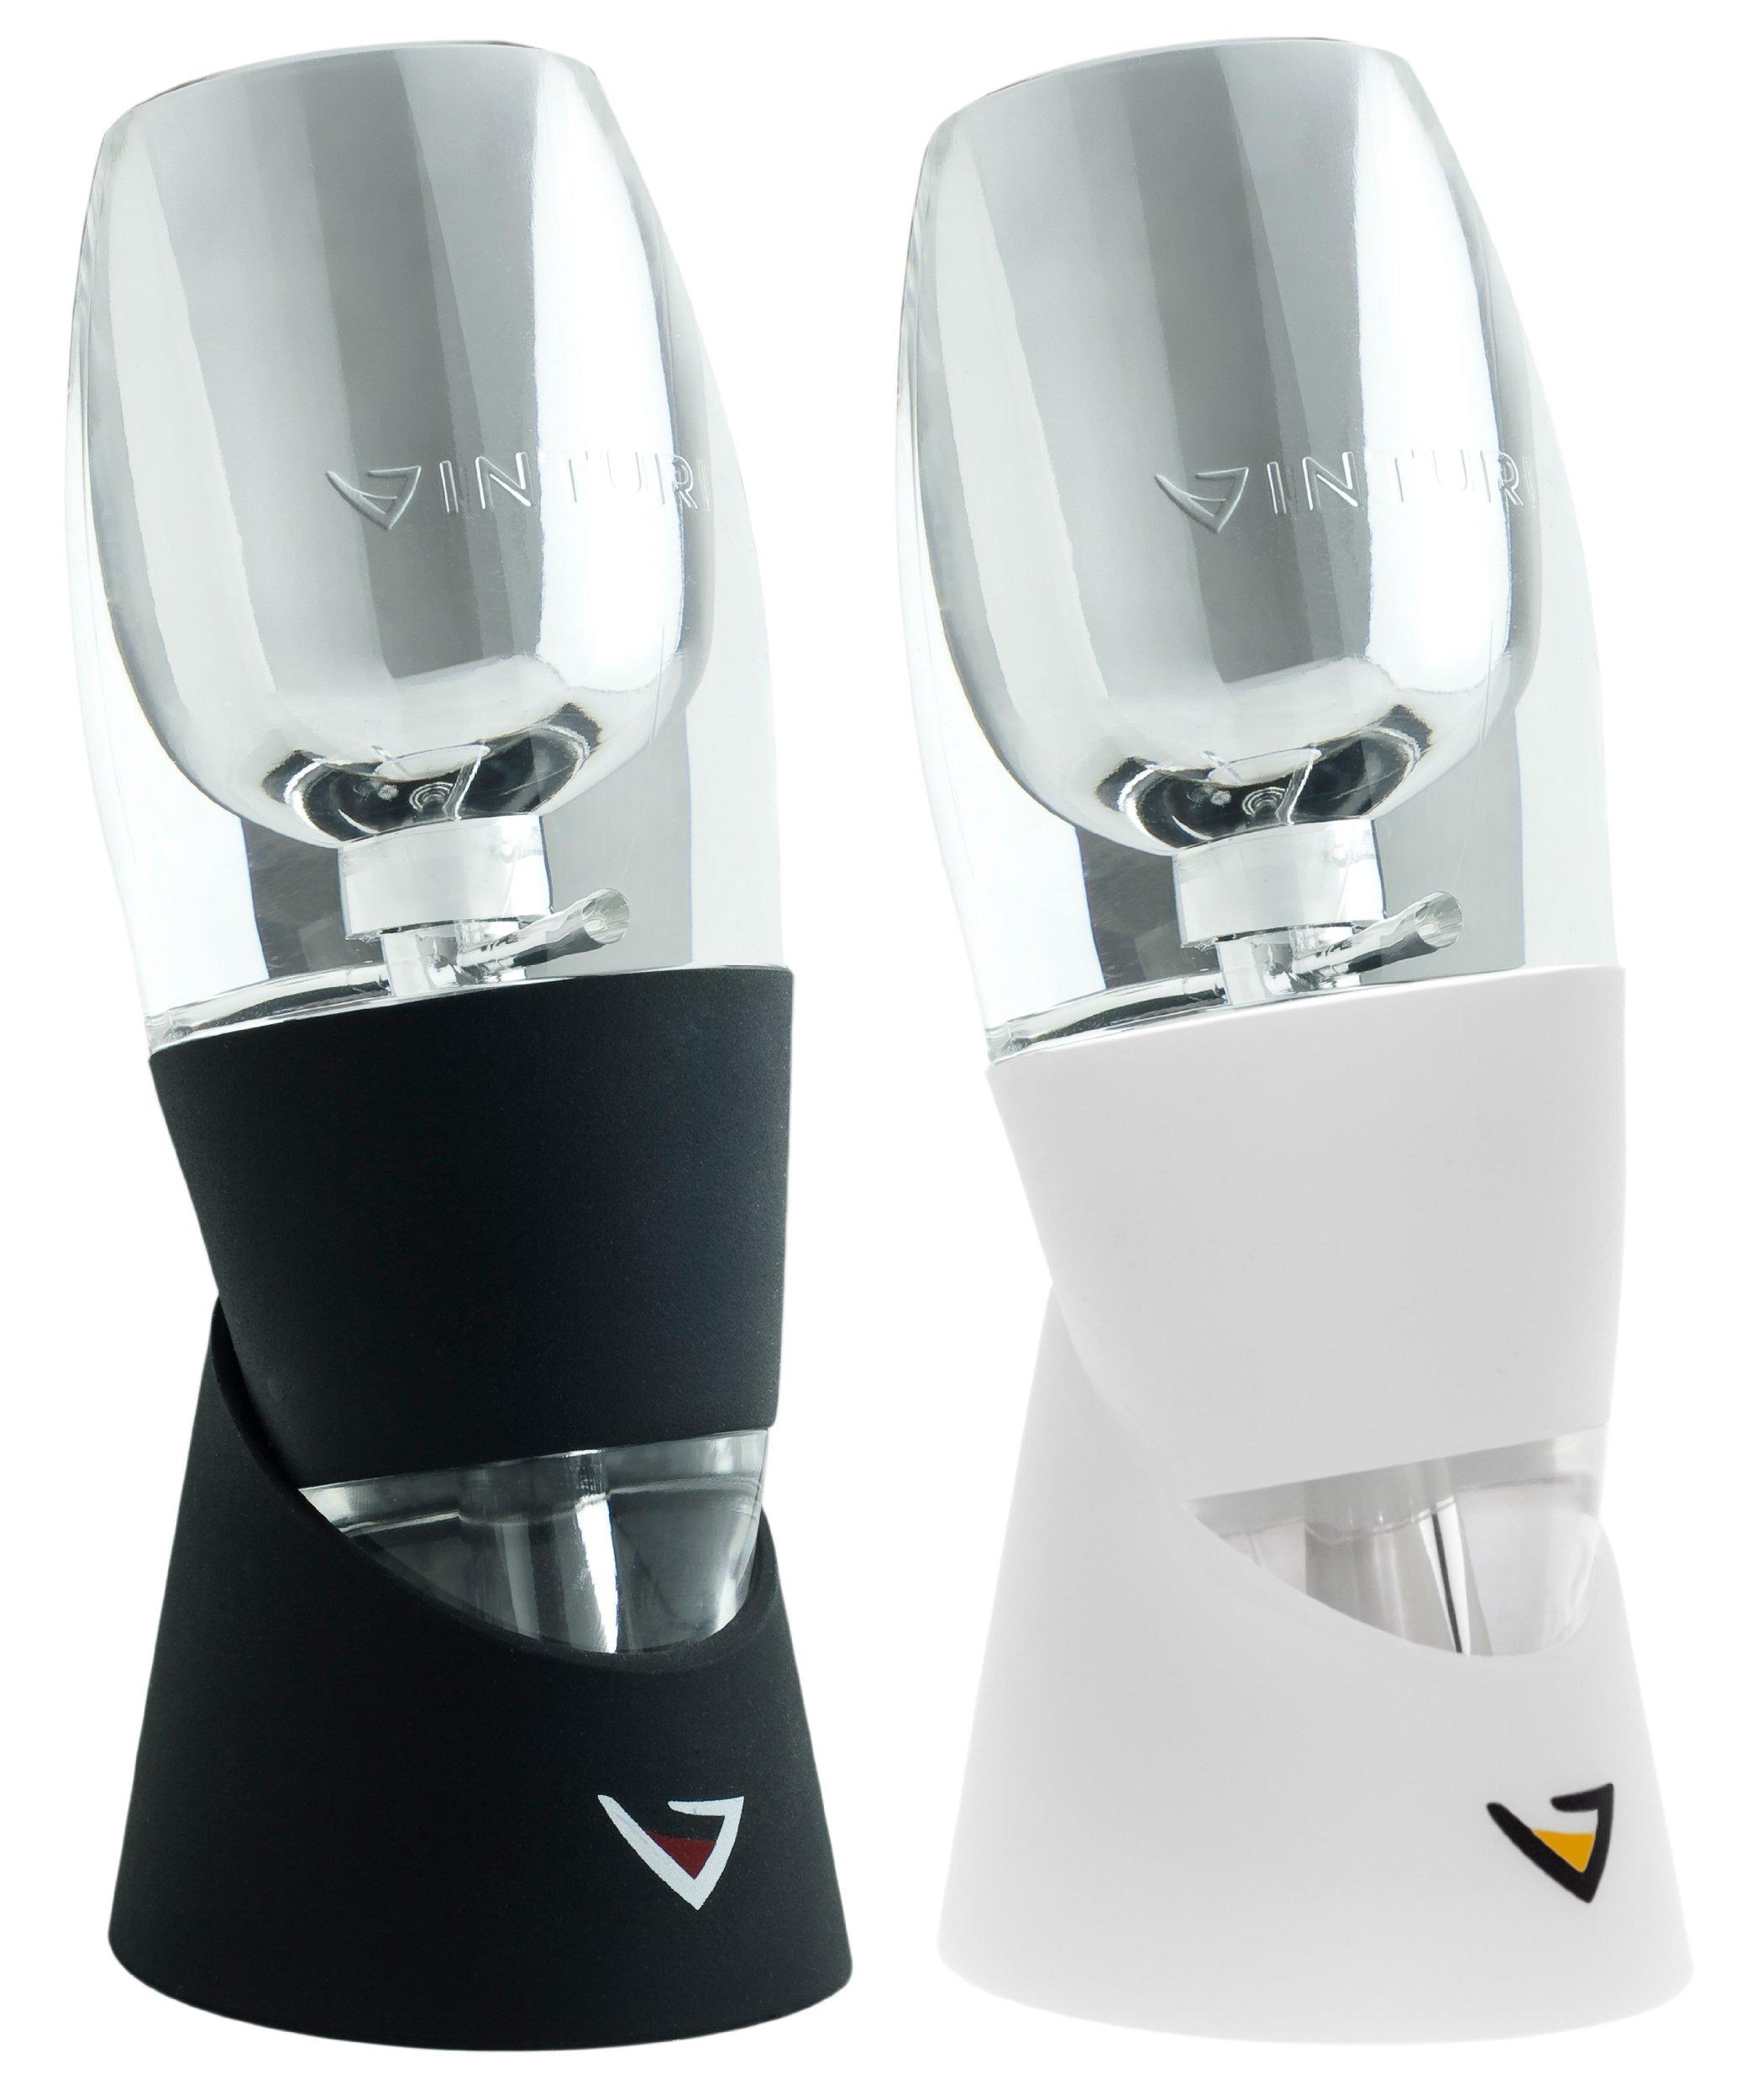 Vinturi V5000 Set of 2 Essential Wine Aerators for Red and White Wine by Vinturi